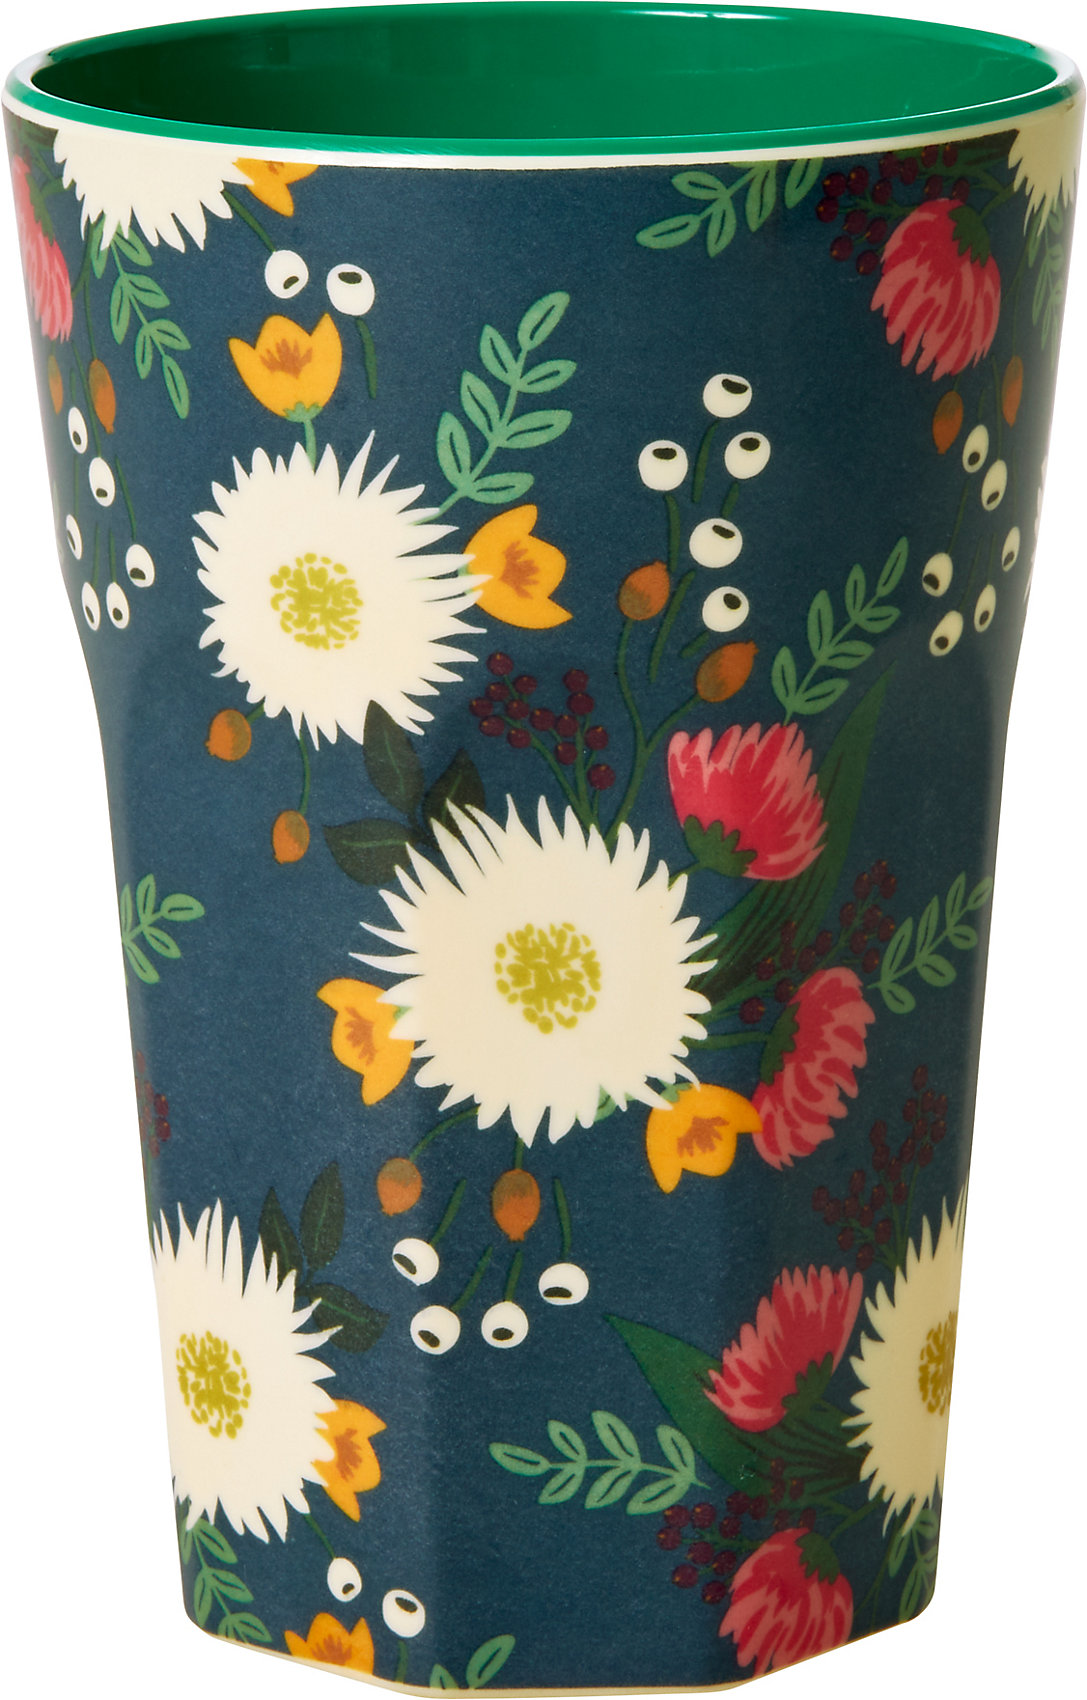 "Indexbild 2 - Neu rice Melamin Trinkbecher ""Wedding Bouquet"", H9cm 20698301 blau/grün"